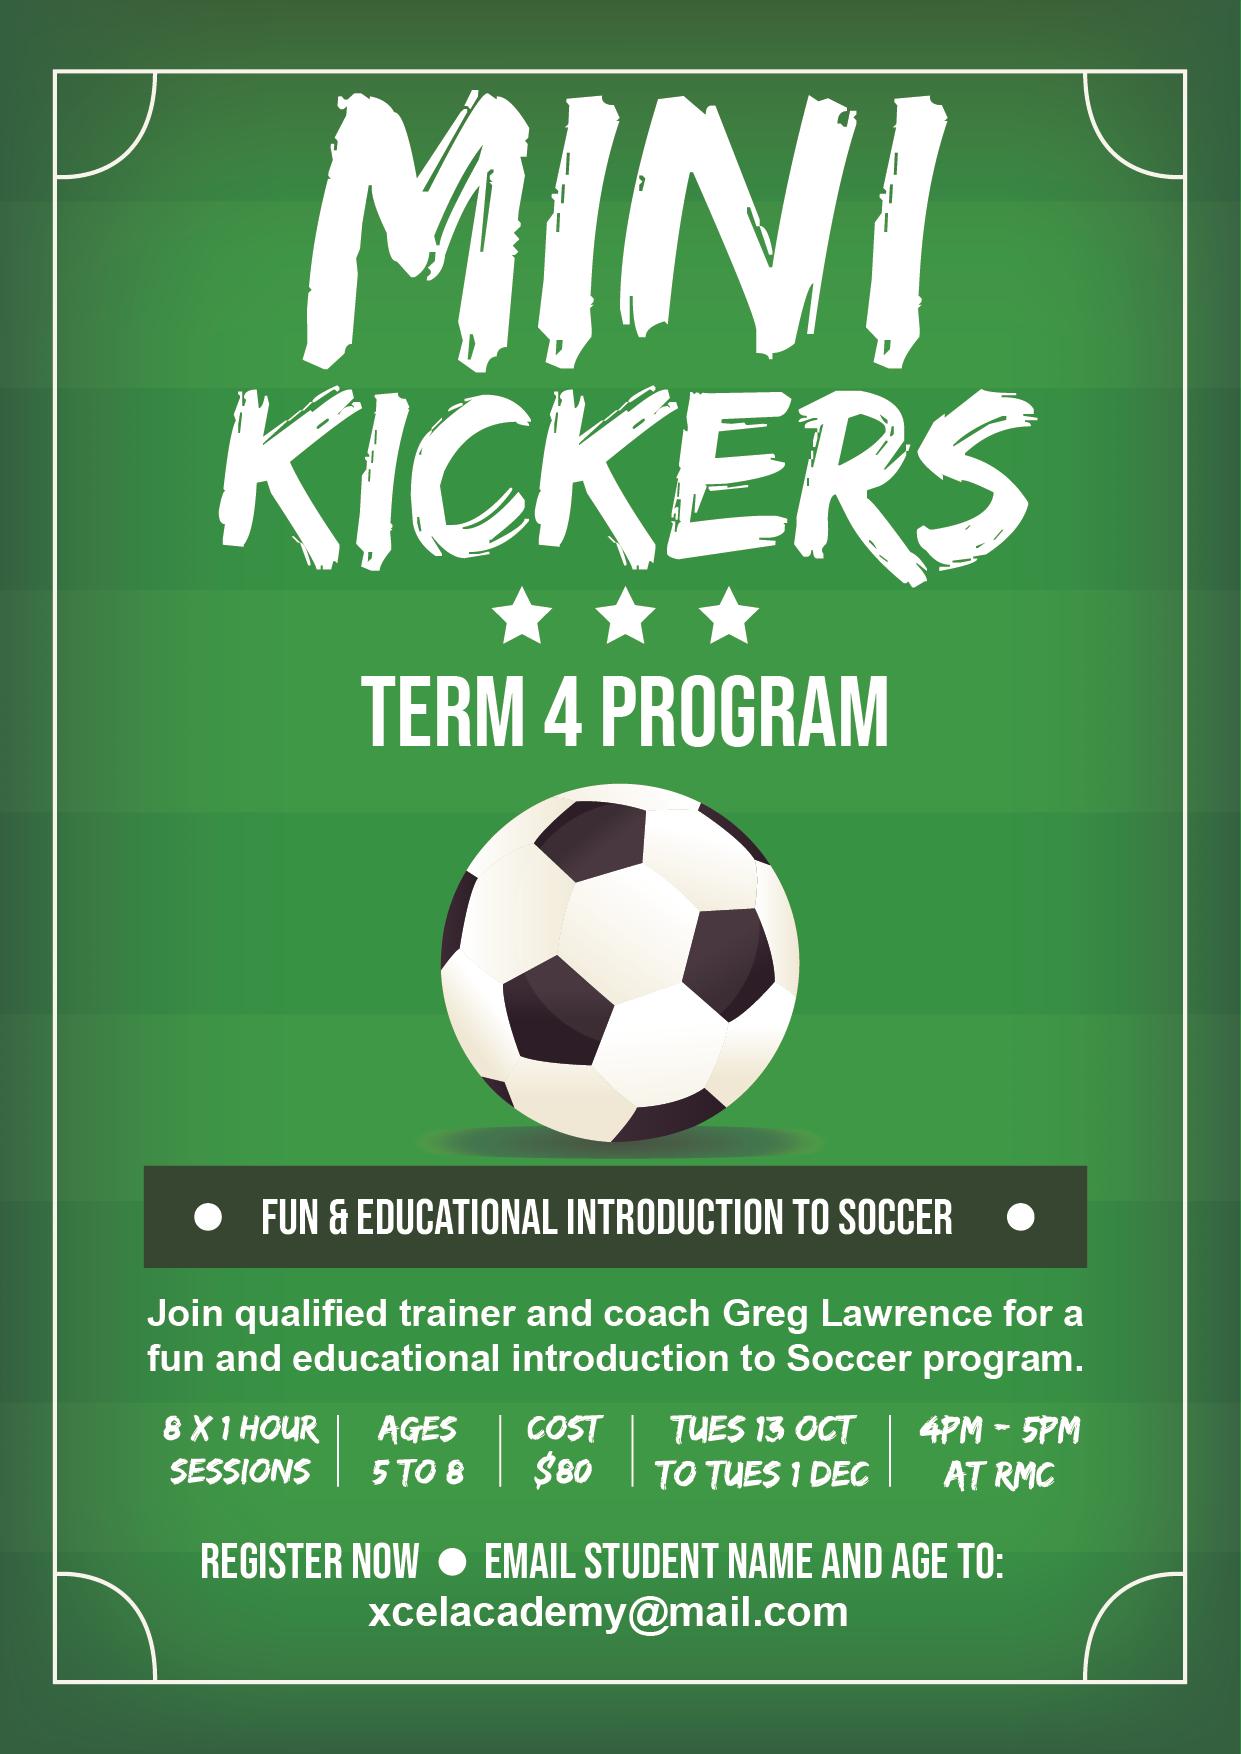 Mini-Kickers-Flyer_200930_115739.png?mtime=20200930115739#asset:4554